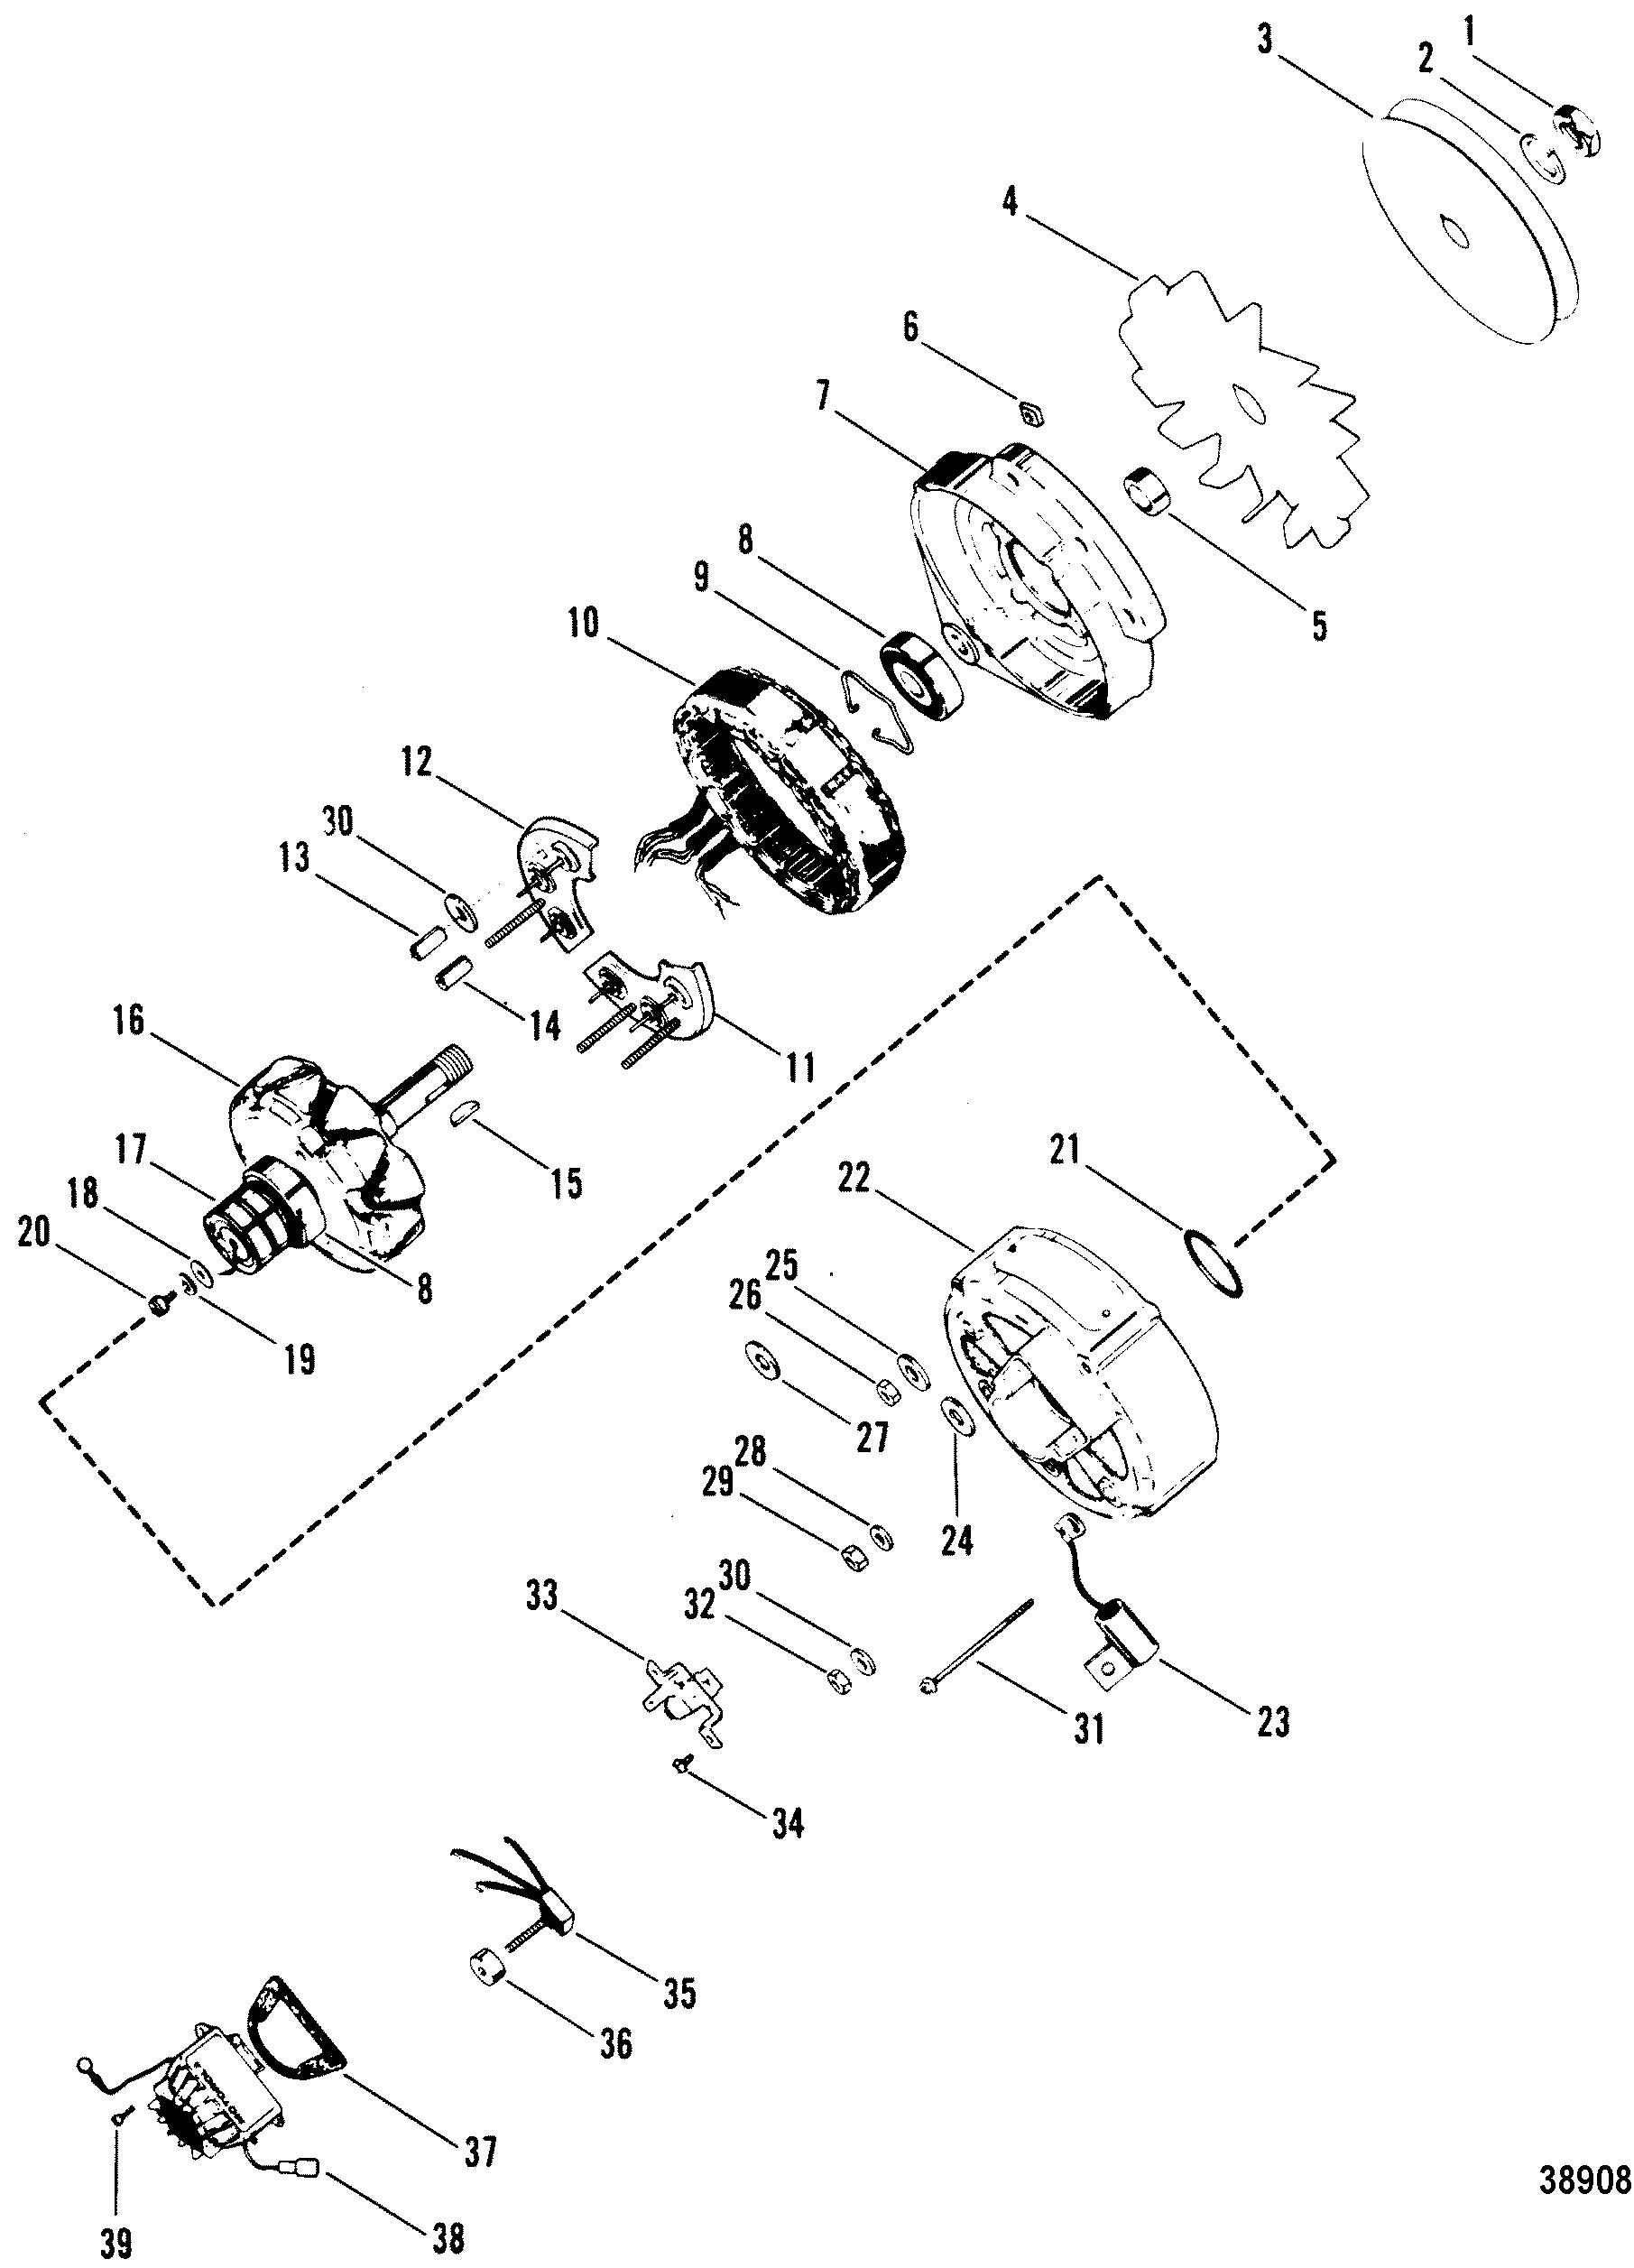 1978 Mercruiser Wiring Diagram Starter Relay 5 7l Competition Ski Gm 350 V Solenoid 898